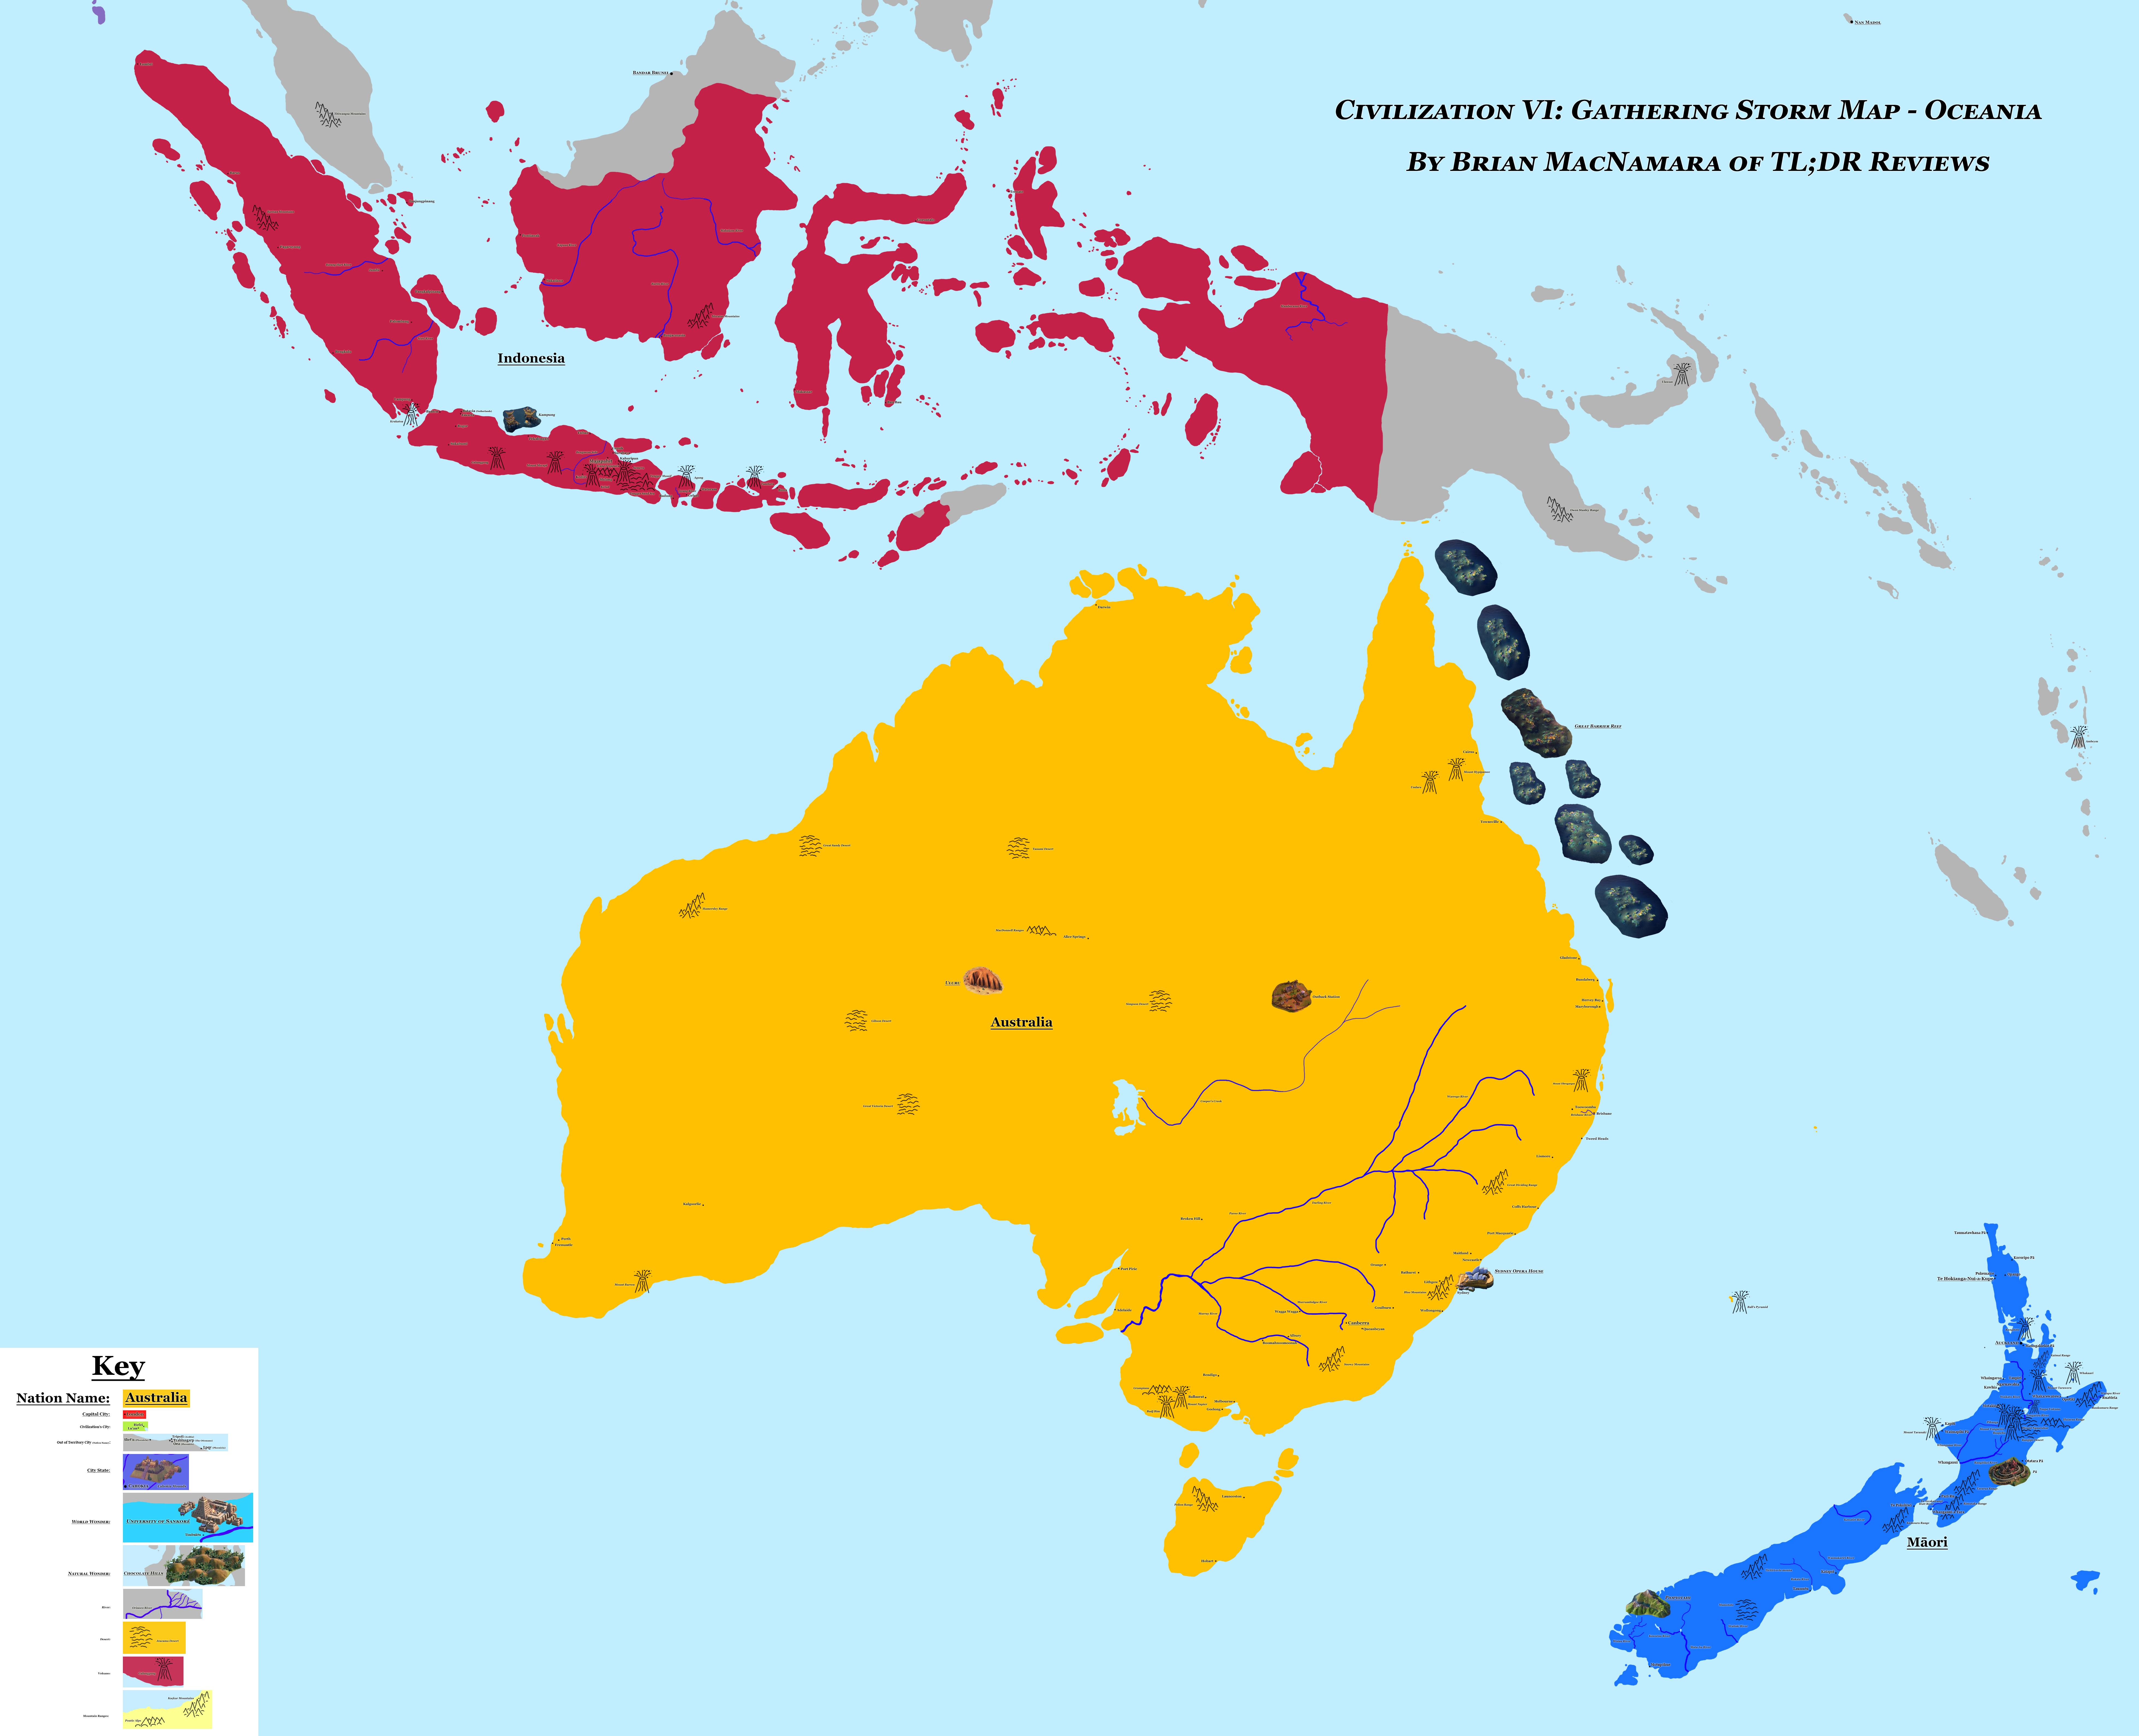 Oceania in Civilization VI: Gathering Storm.